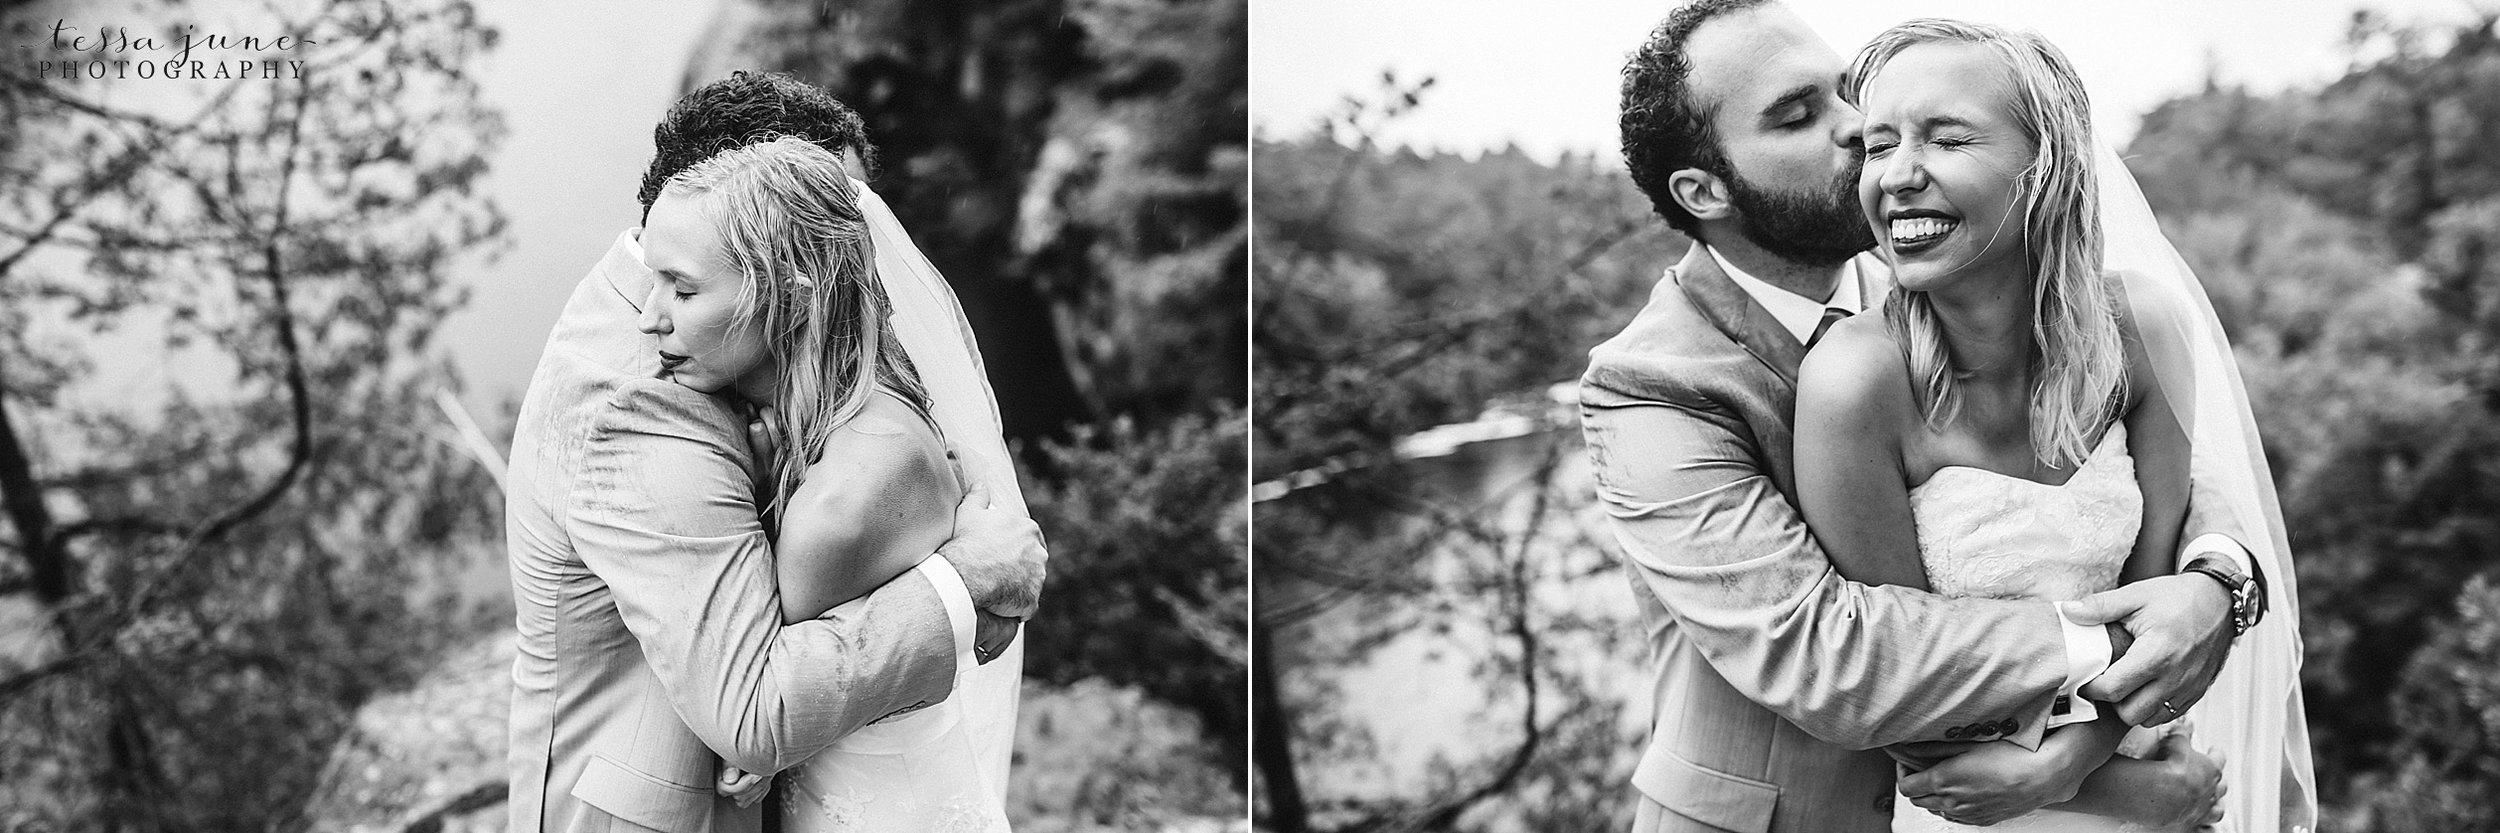 taylors-falls-rainy-elopement-wedding-interstate-state-park-90.jpg